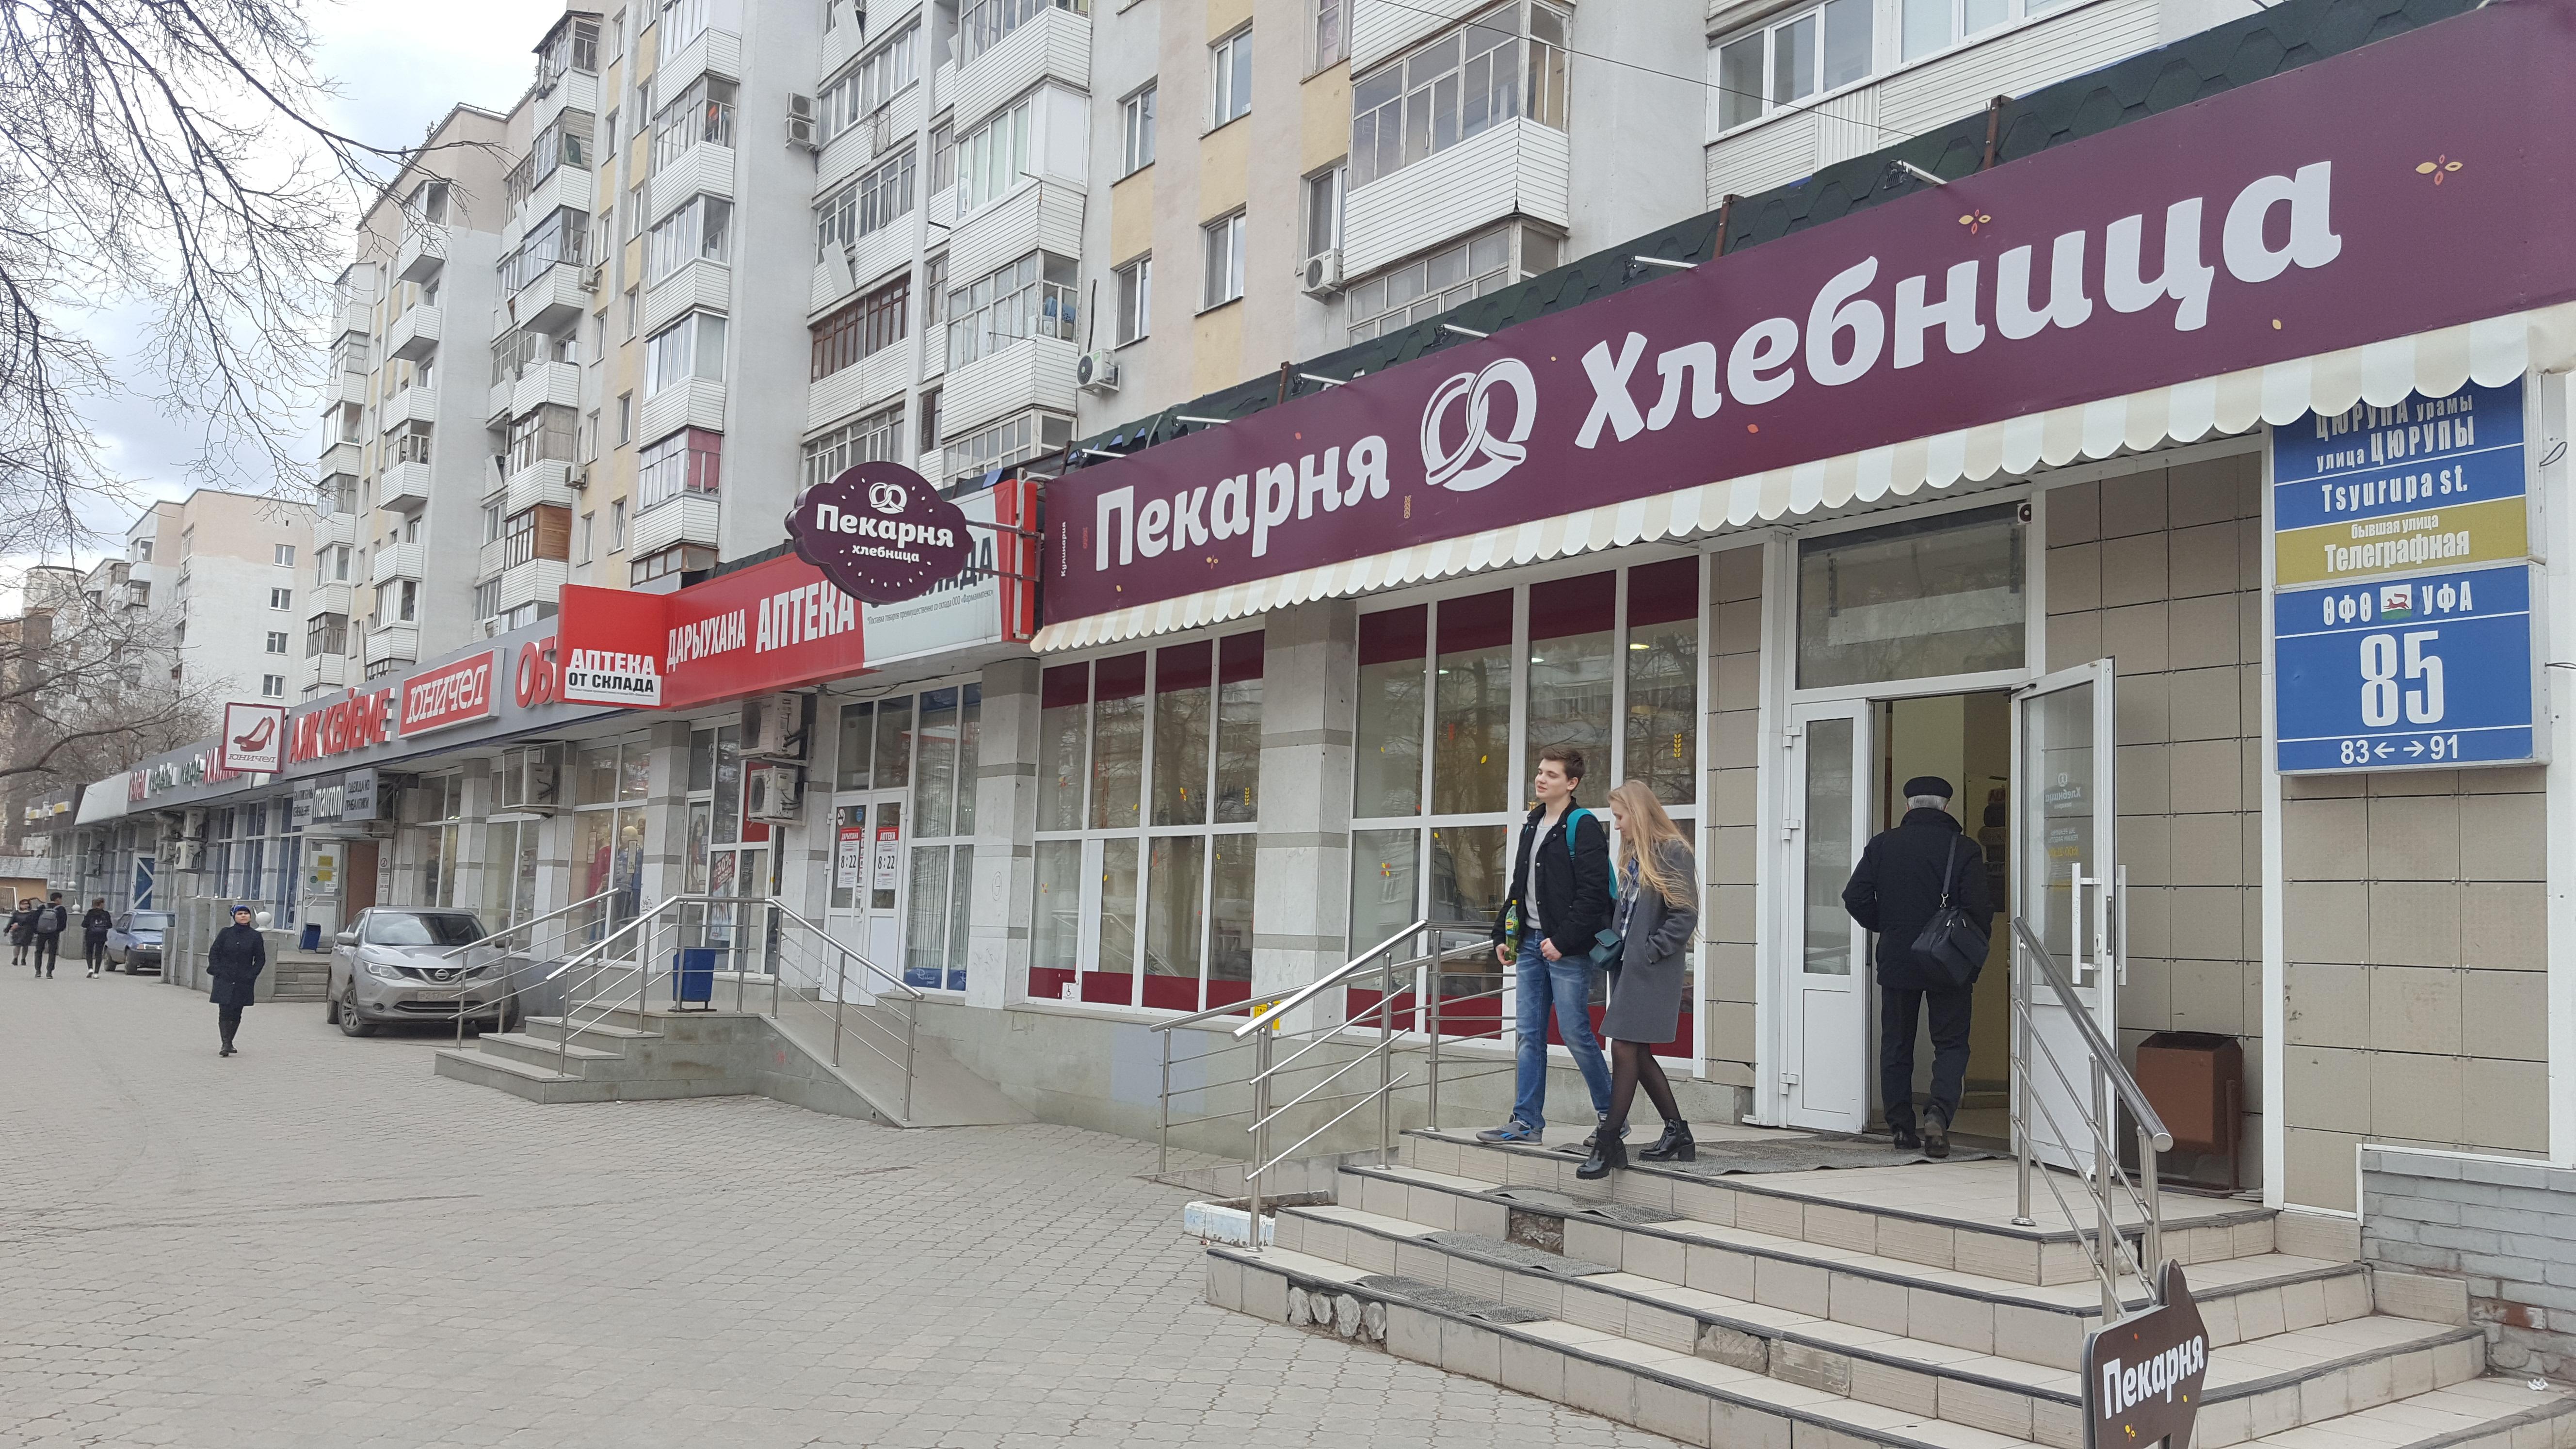 Магазин-склад цветы на ул. цюрупы г. москва, цветов рисунком